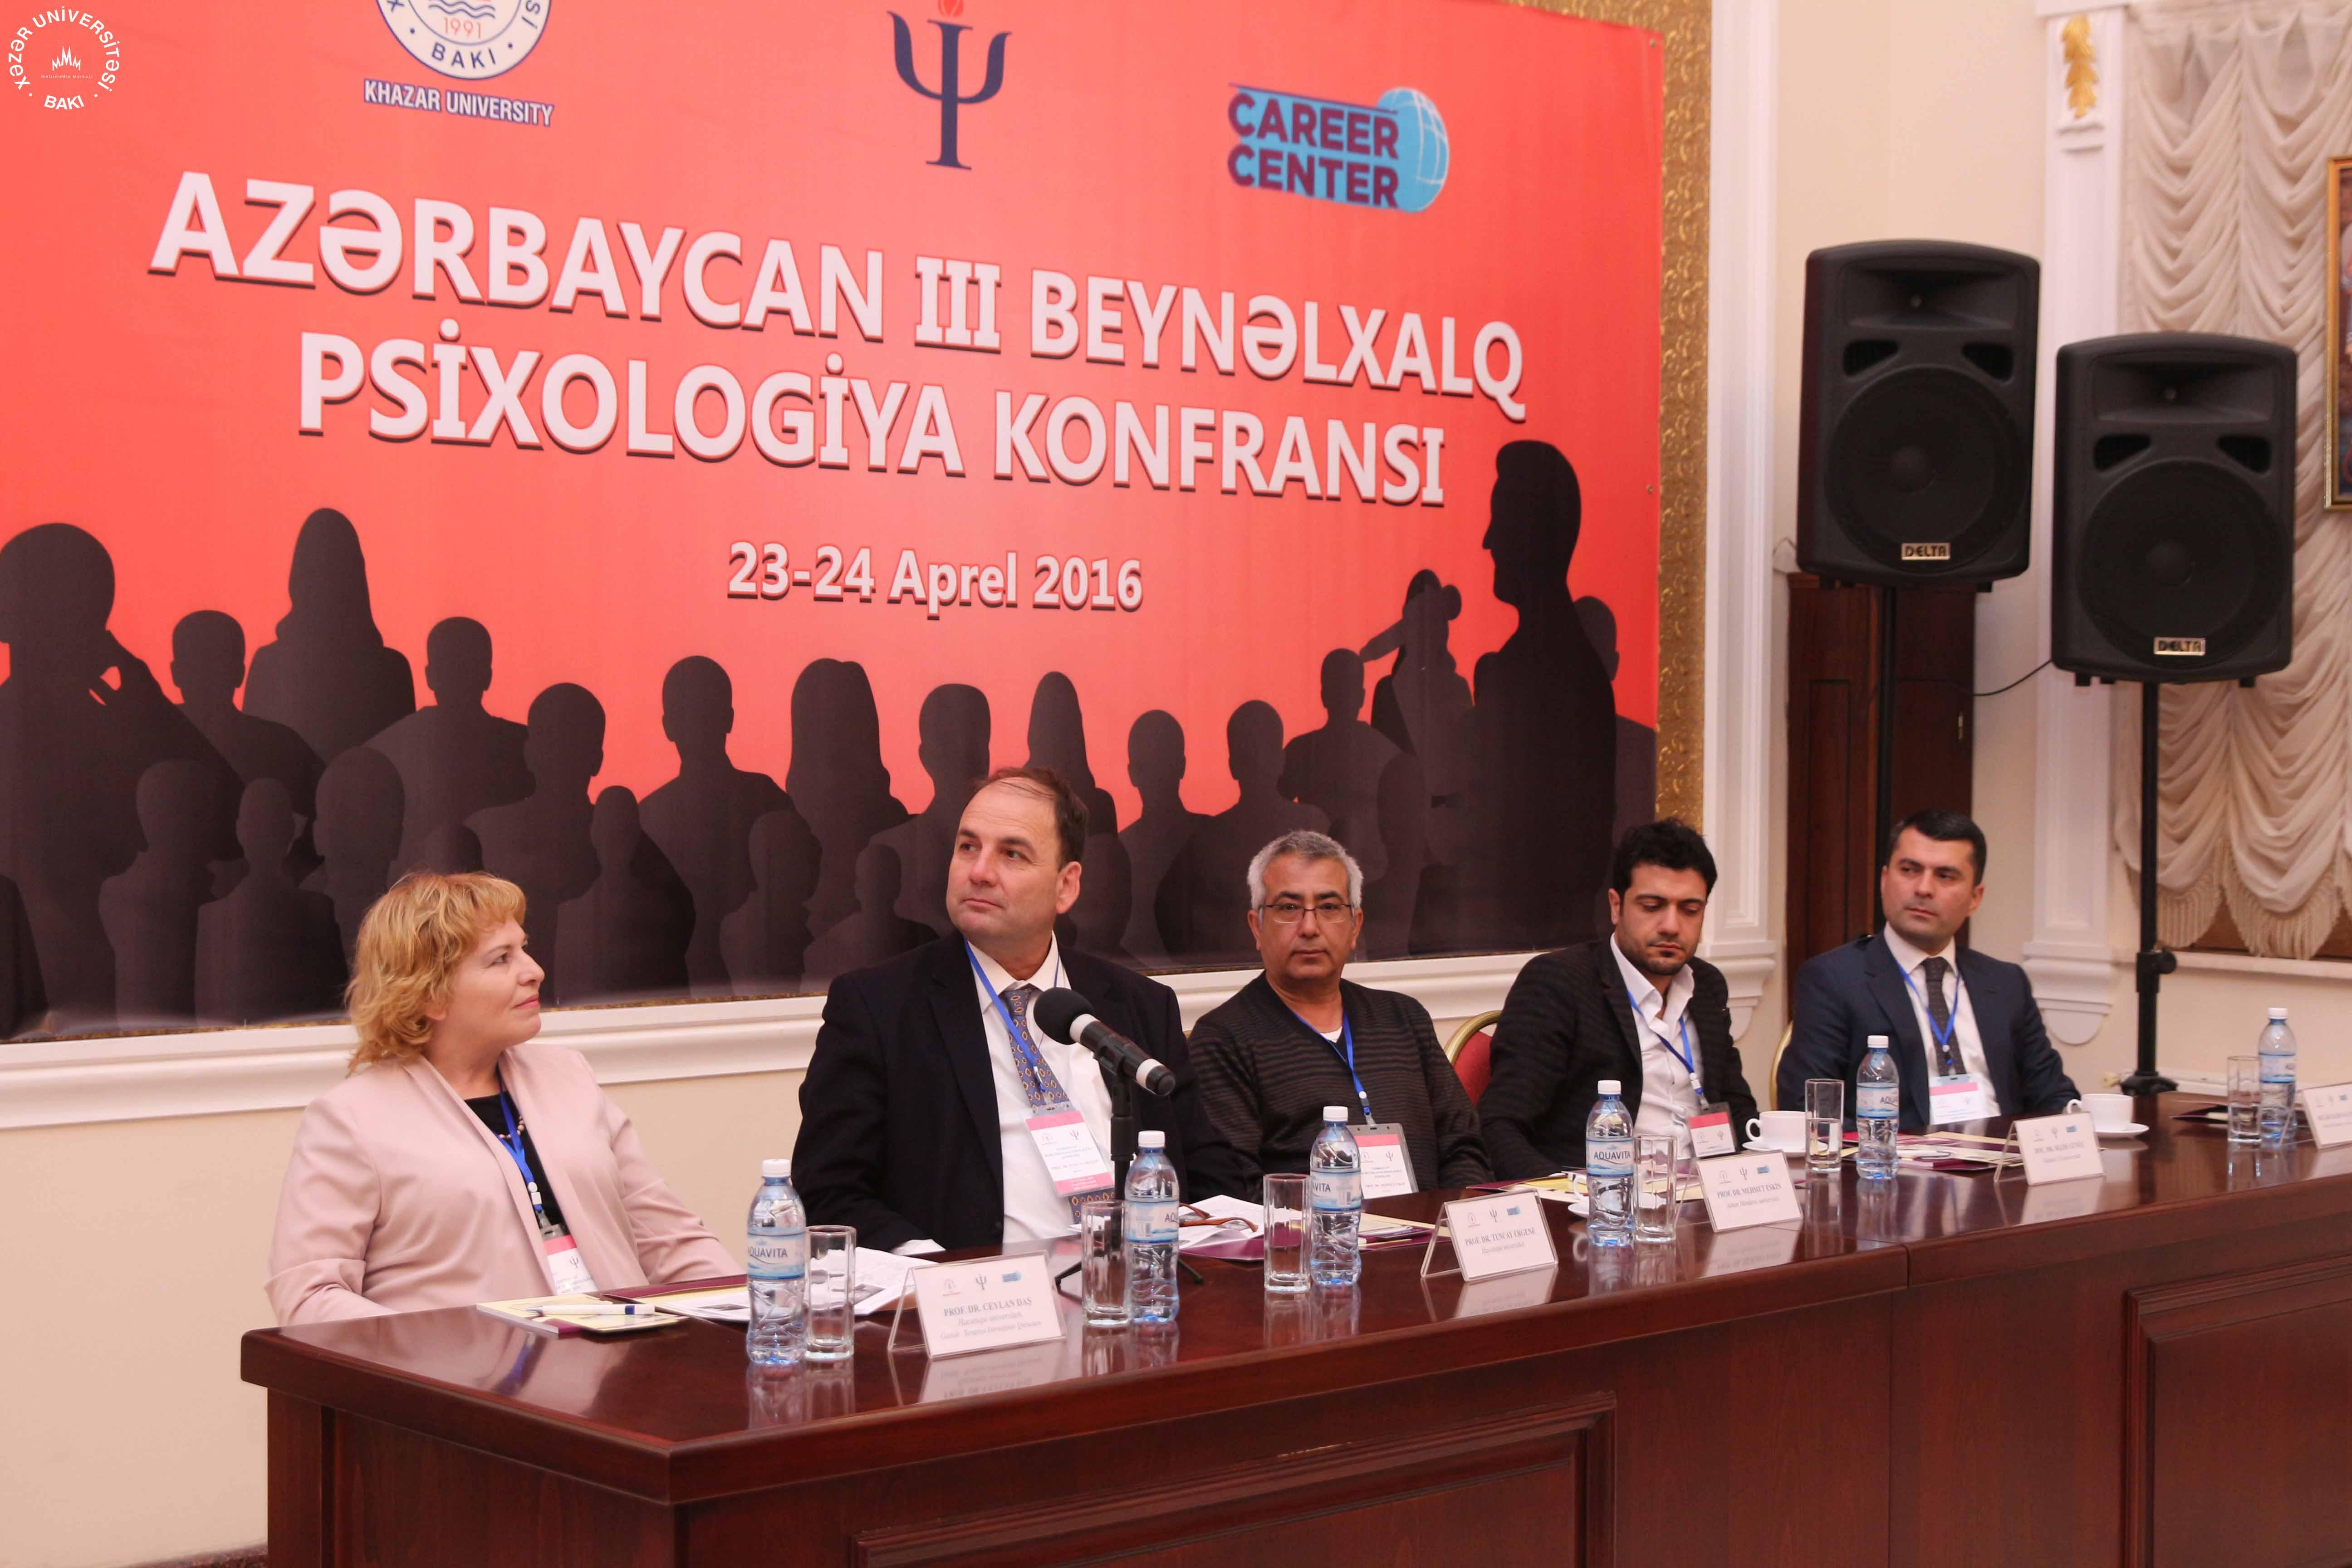 Azerbaijan's III International Psychology Conference